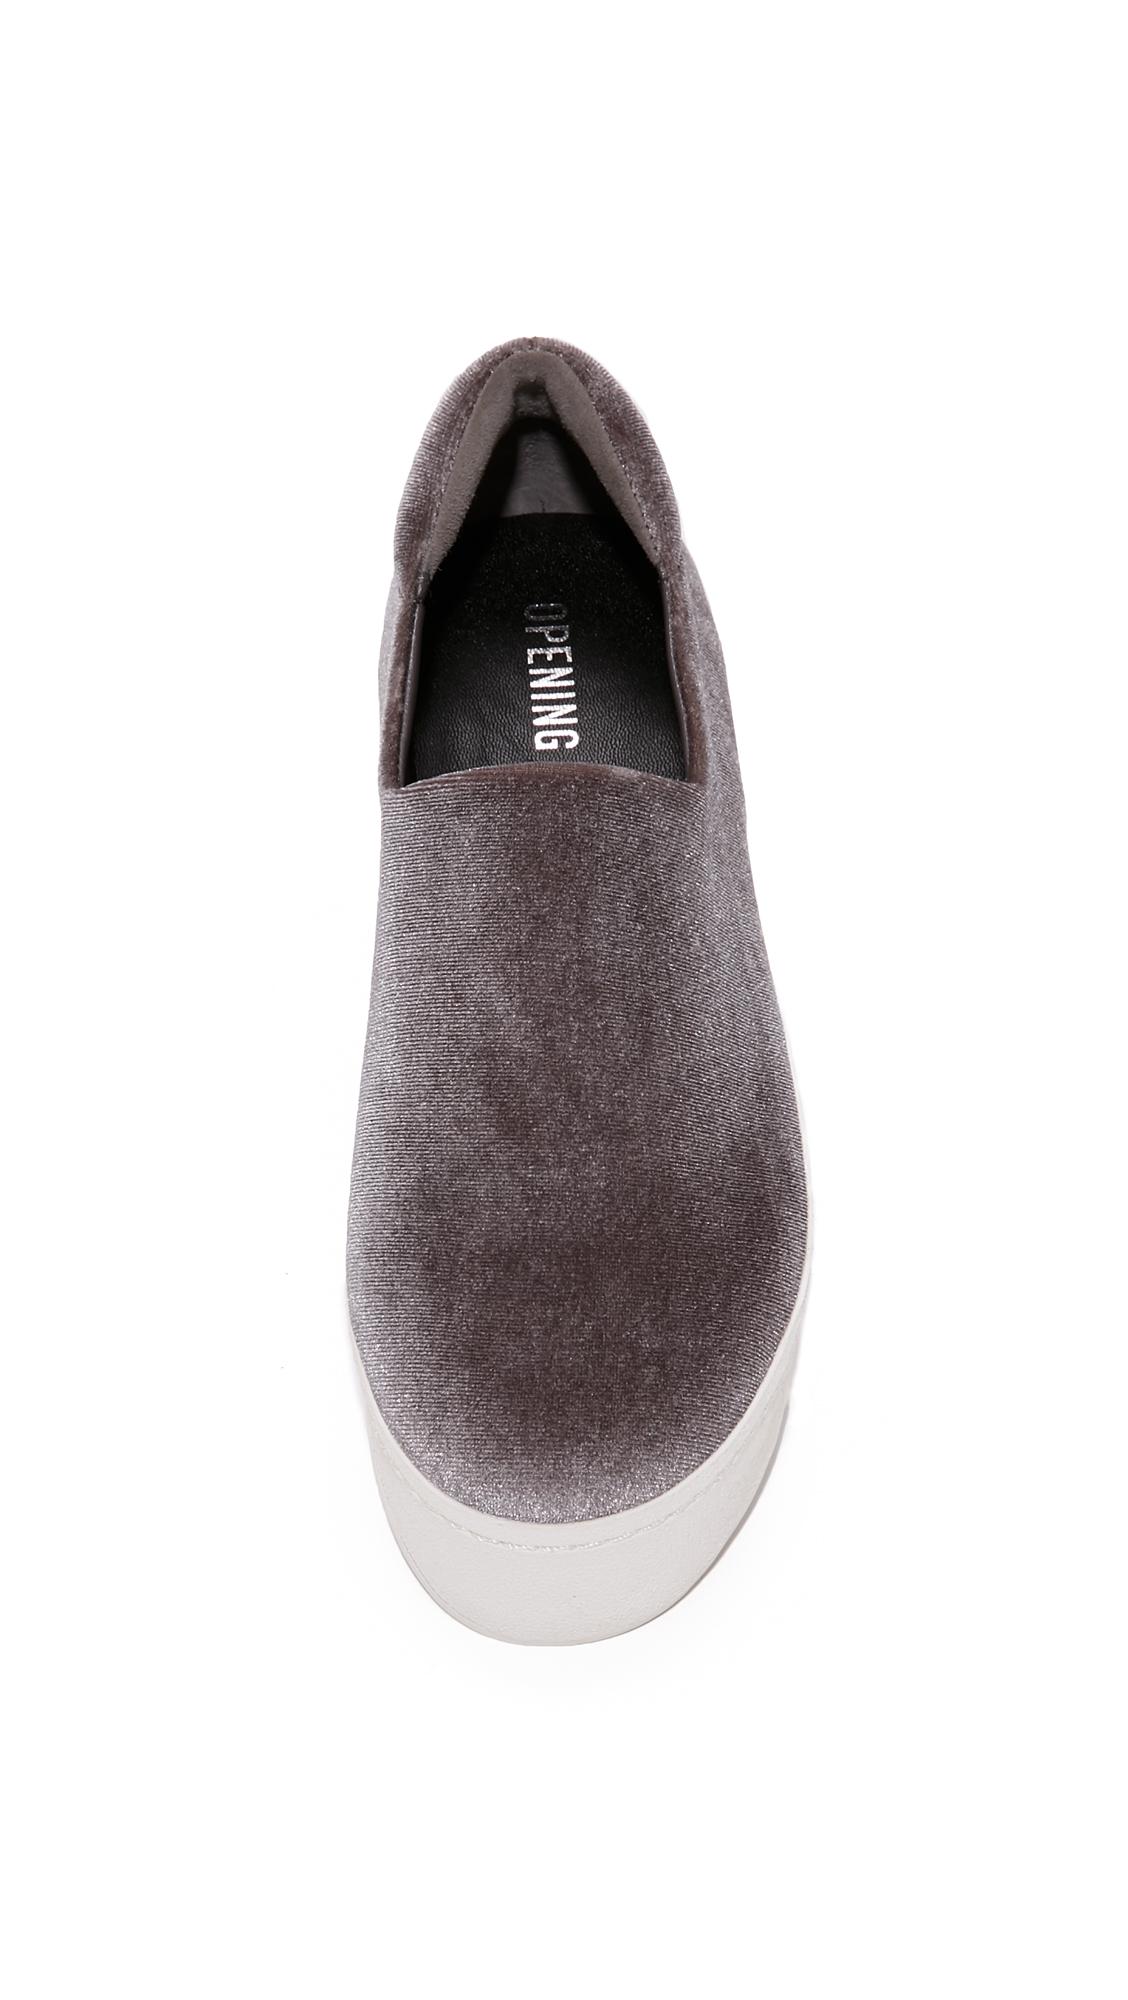 Opening Ceremony Cici Platform Slip On Sneakers Shopbop D Island Shoes Moccasine Lacoste Suede Blue